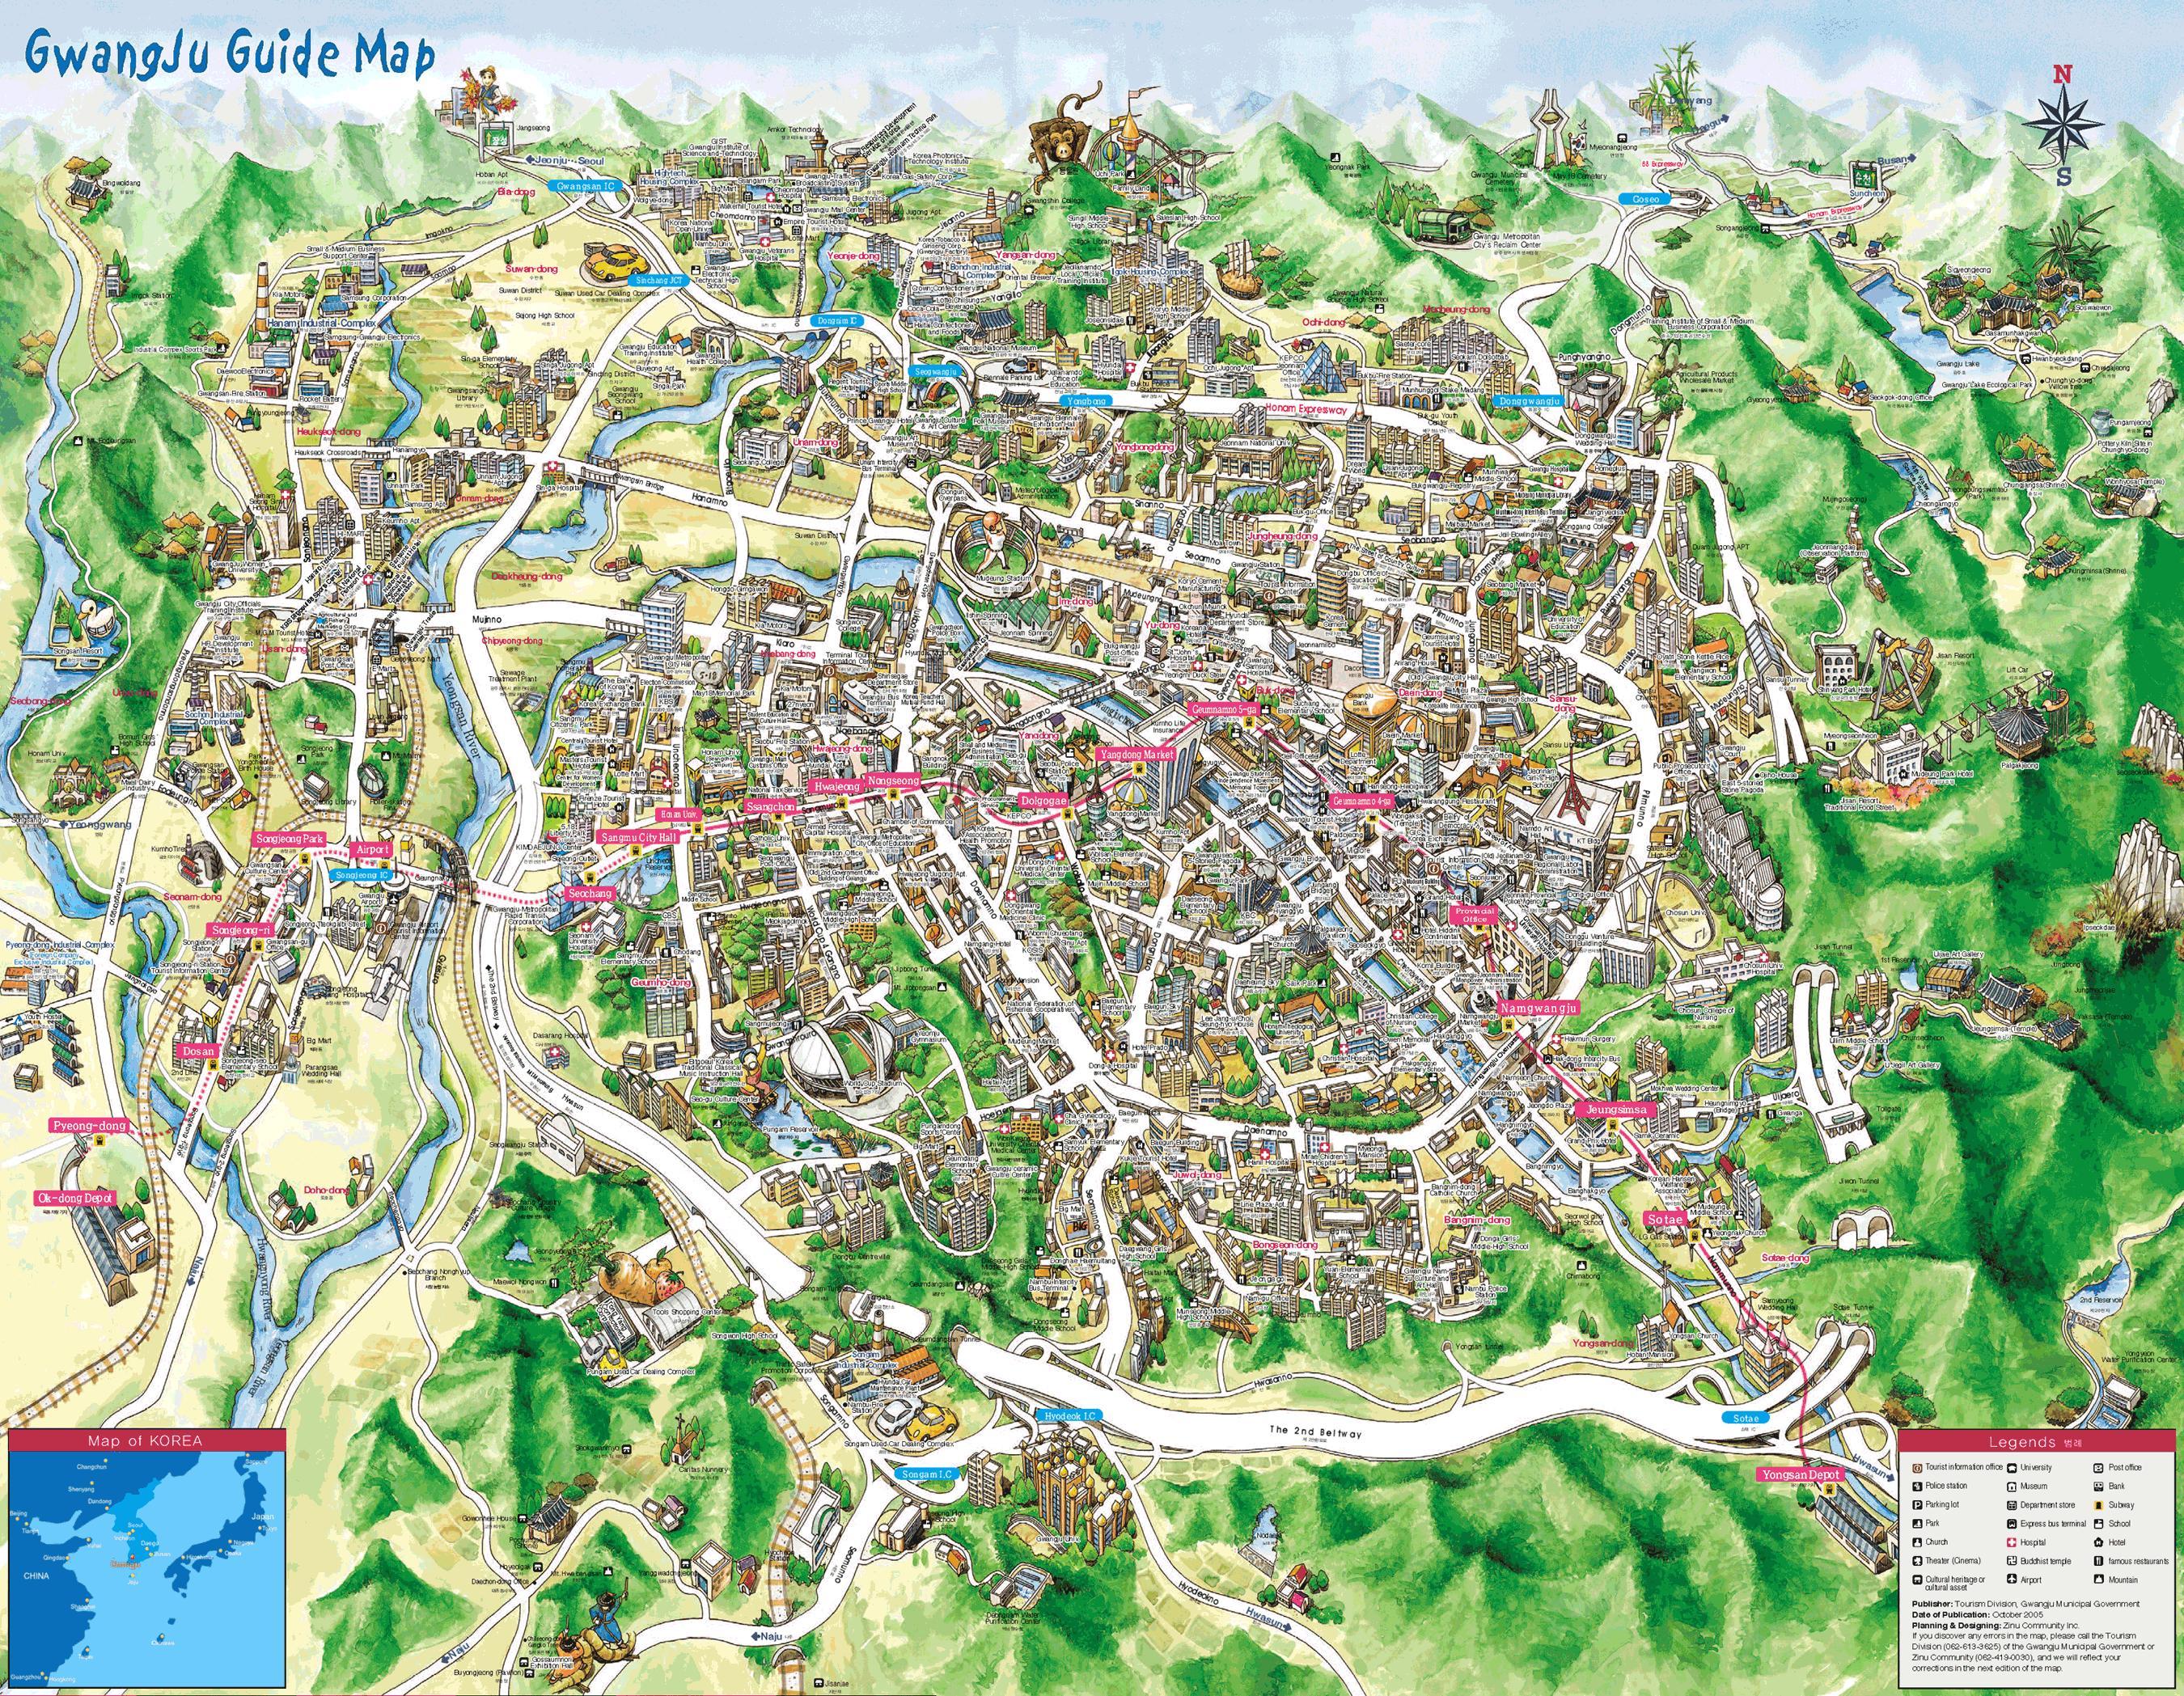 Gwangju tourist map